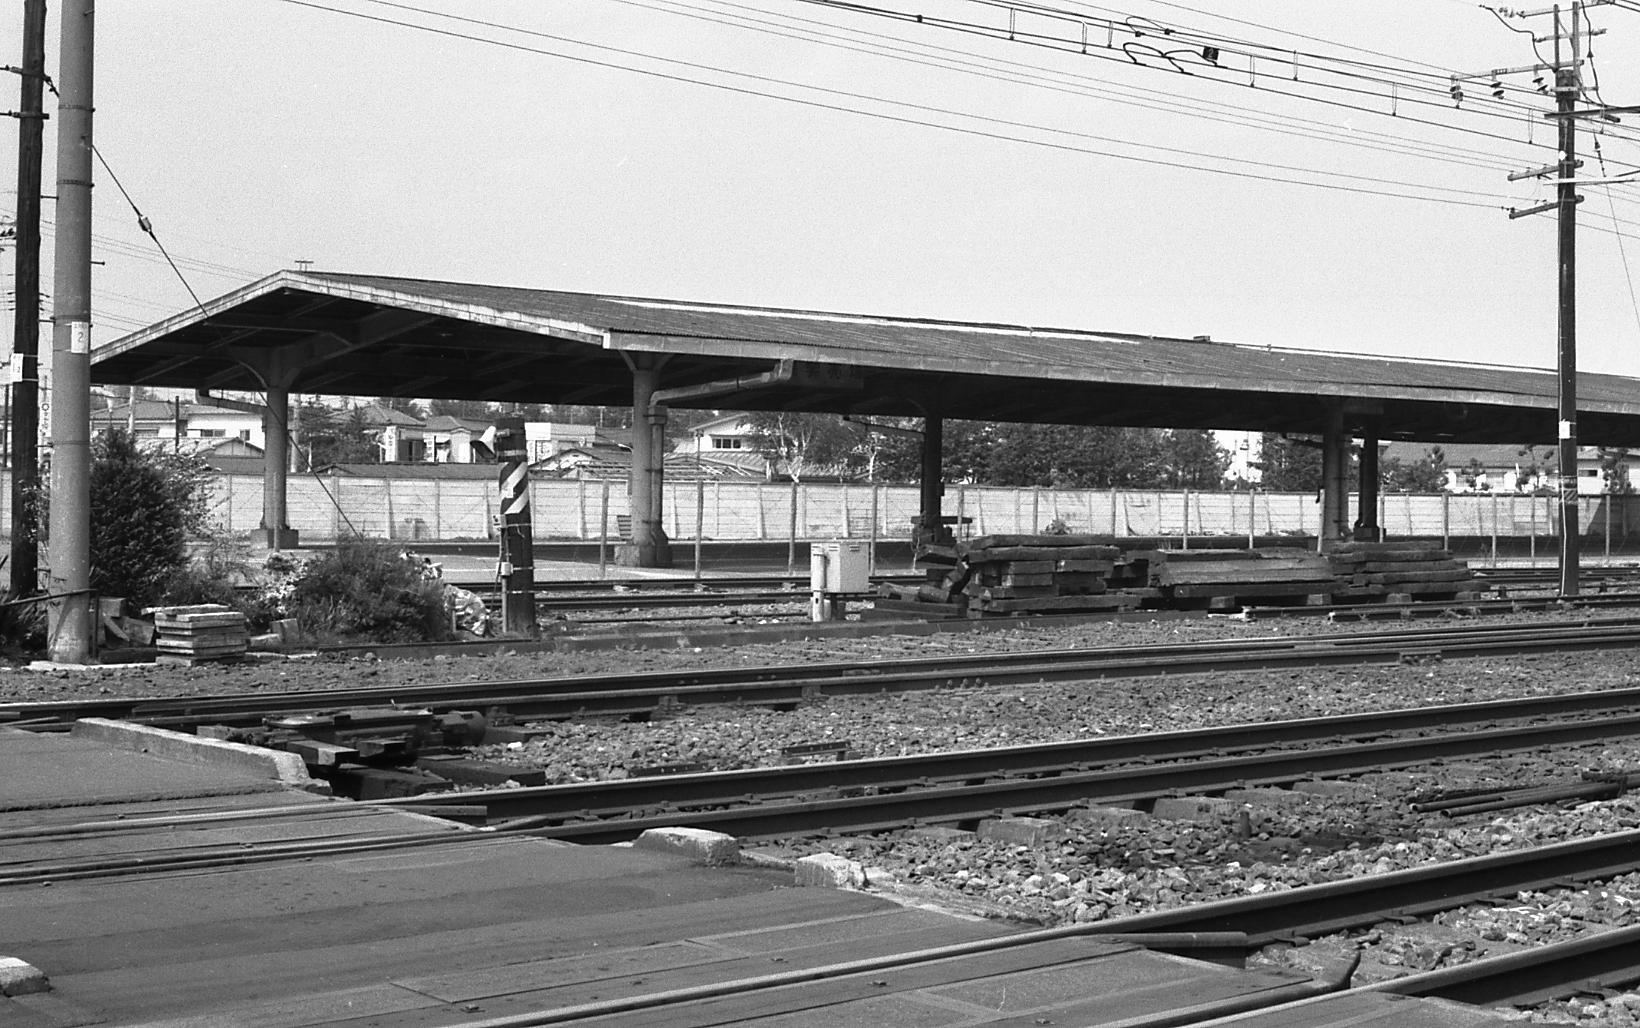 http://senrohaisenzu.cocolog-nifty.com/photos/uncategorized/2008/08/15/19790504tachikawa14.jpg